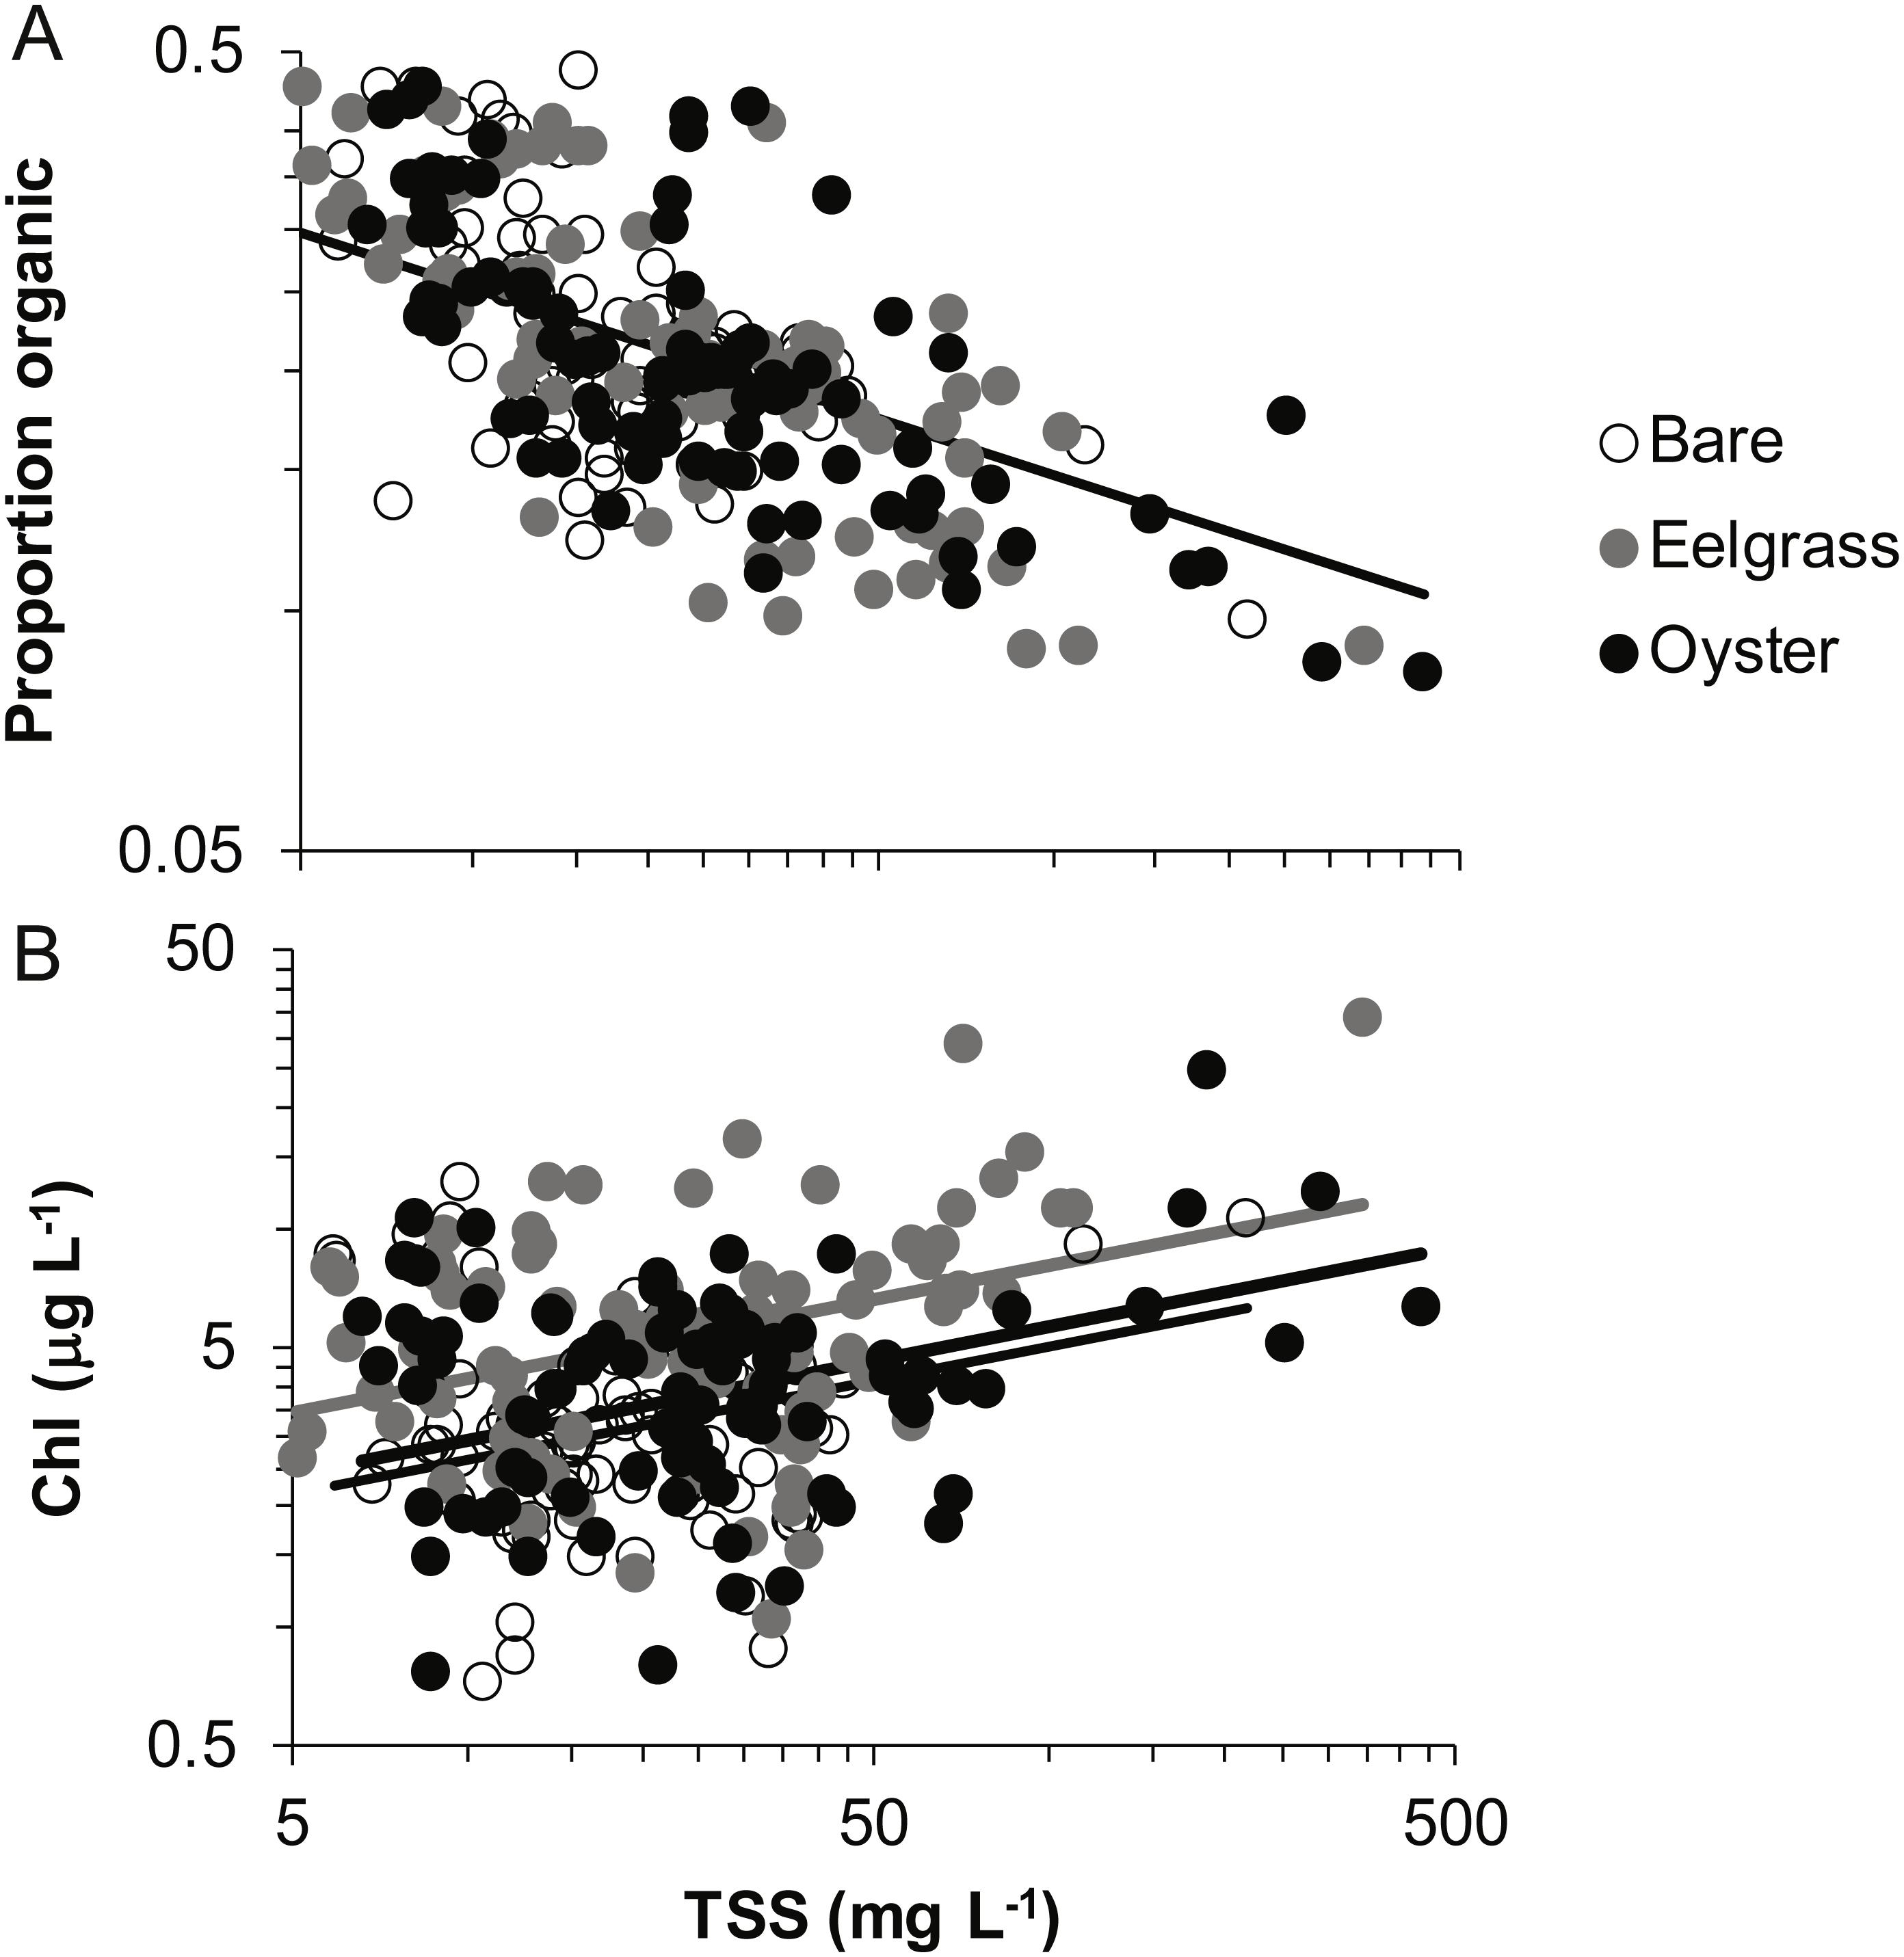 Comparison of shallow-water seston among biogenic habitats on tidal